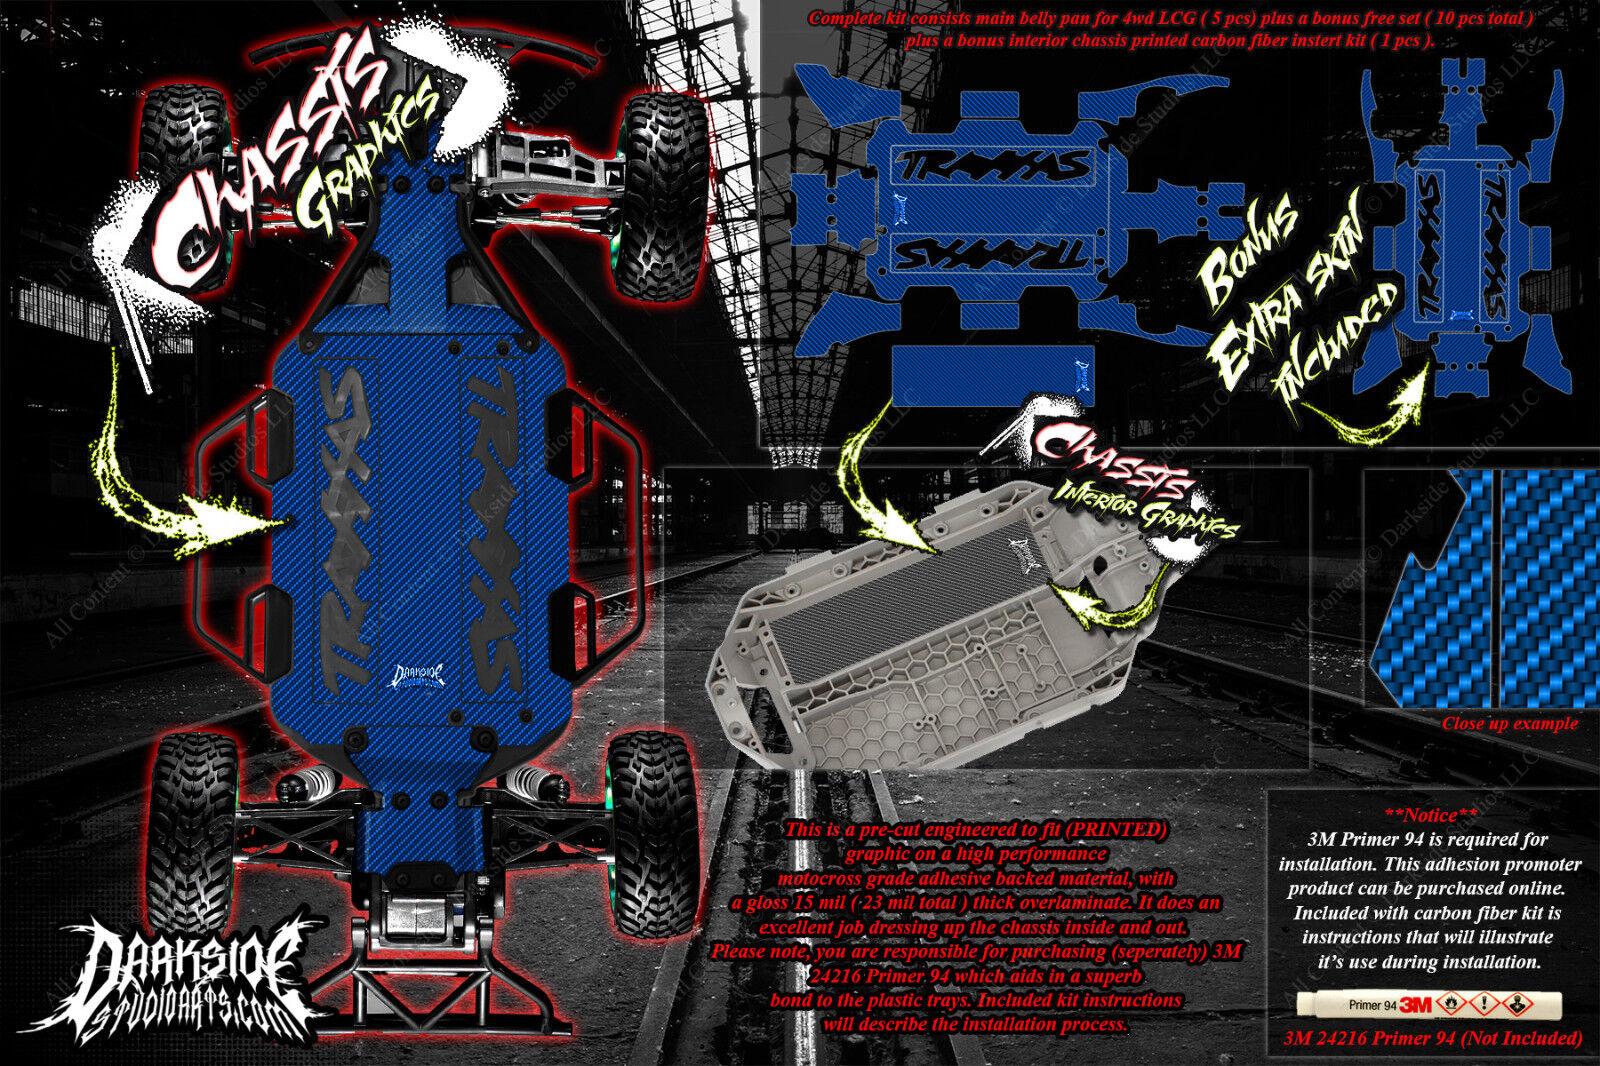 - chassis fr pzw103 kyosho vor plazma formel)